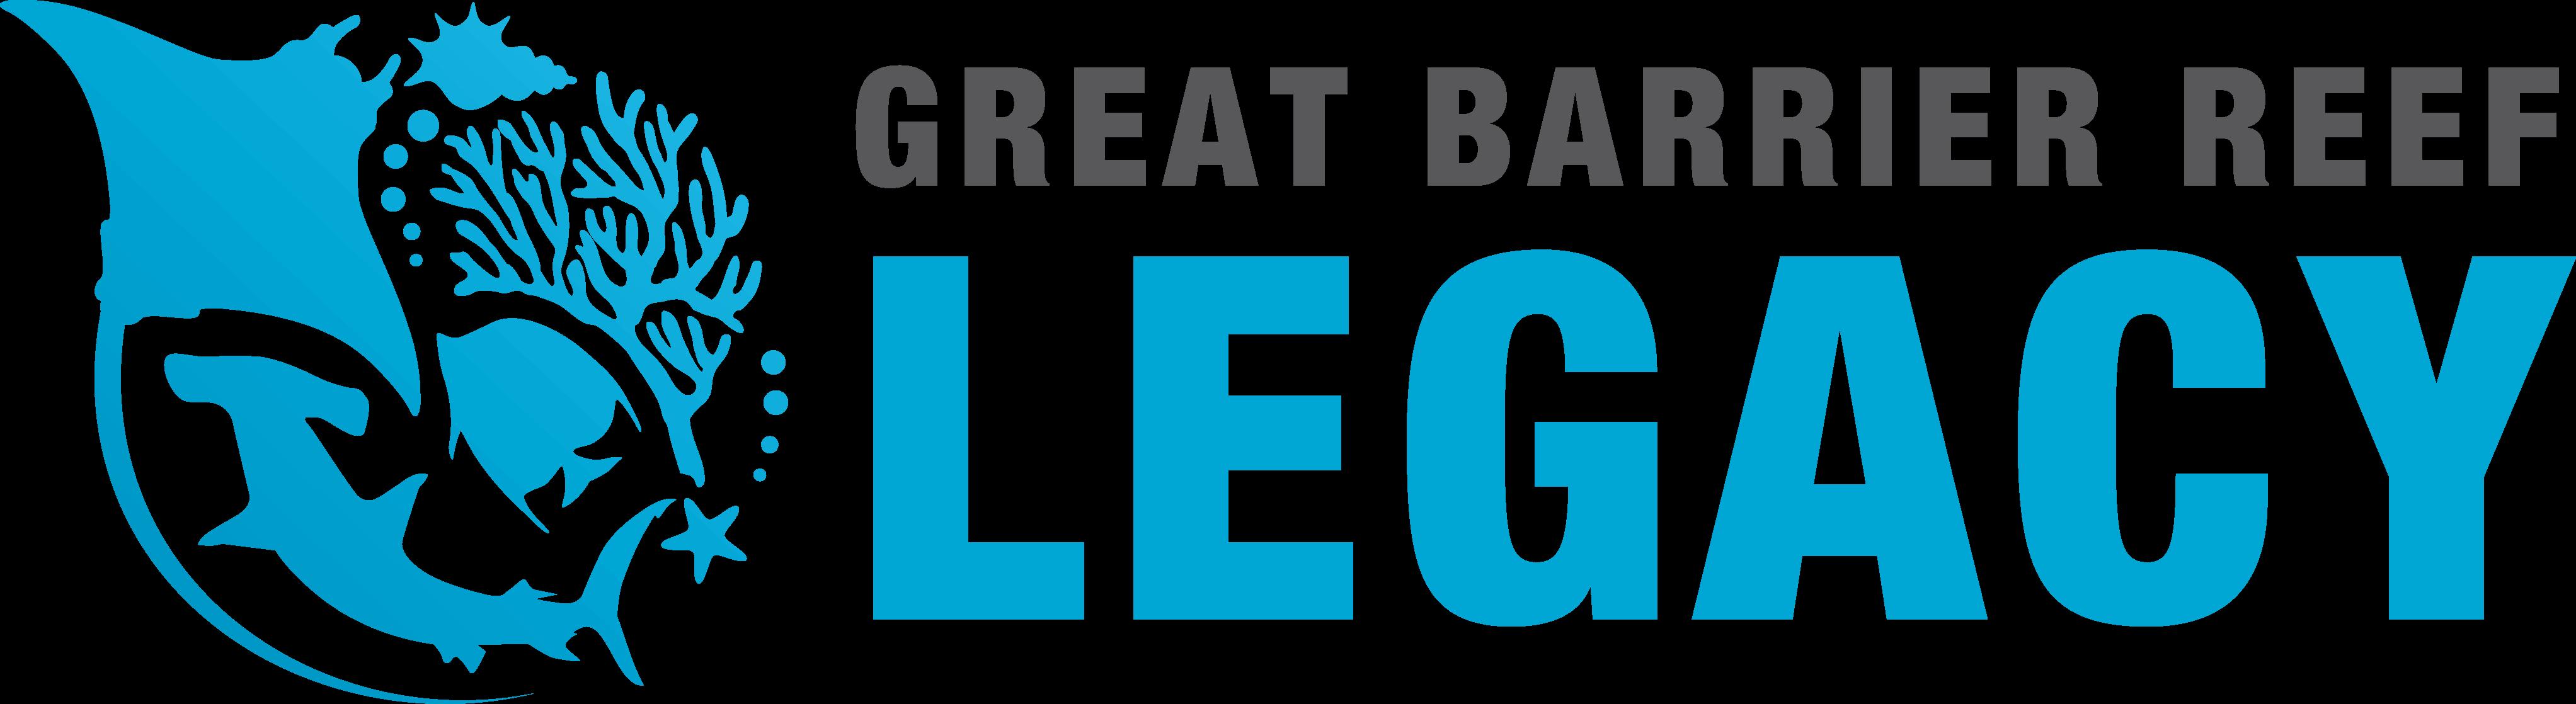 GBR Legacy